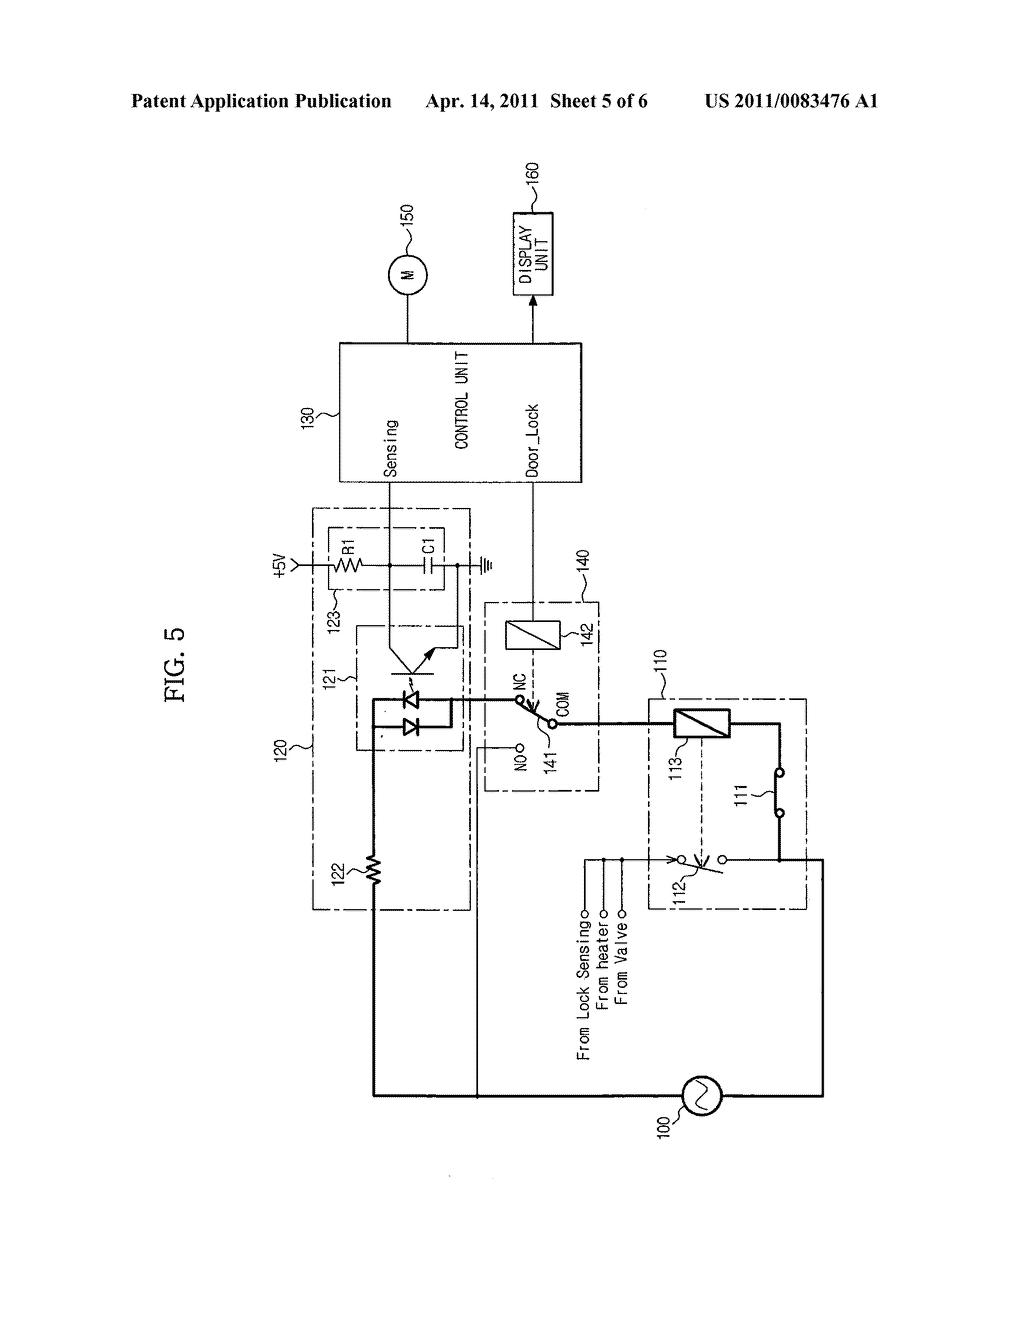 hight resolution of interlock crane electrical diagram wiring diagram third level door lock diagram washing machine door interlock wiring diagram